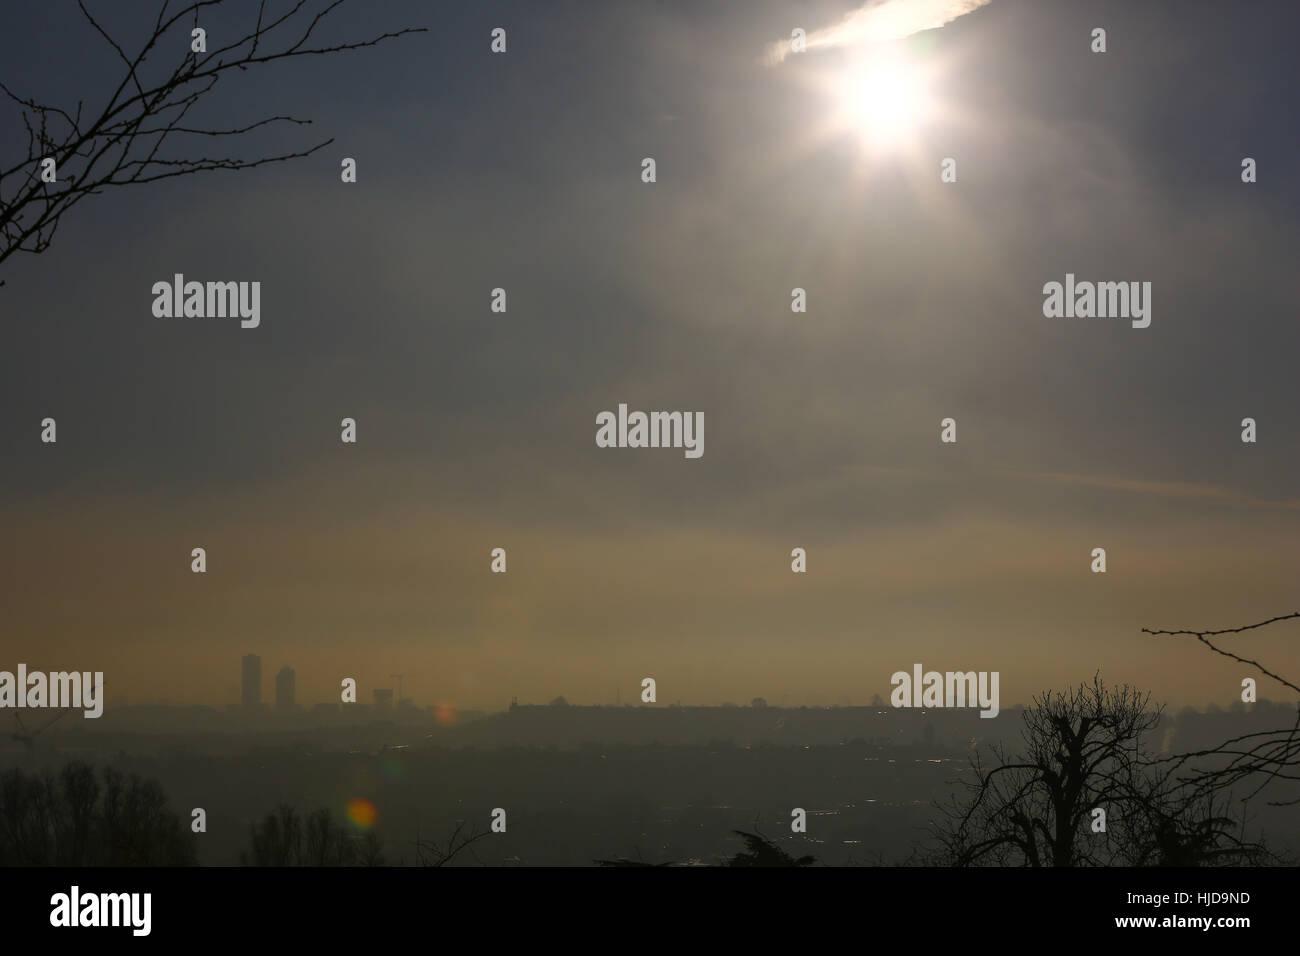 Alexandra Palace, North London, UK. 24th Jan, 2017. UK Weather. View of London from Alexandra Palace, North London - Stock Image